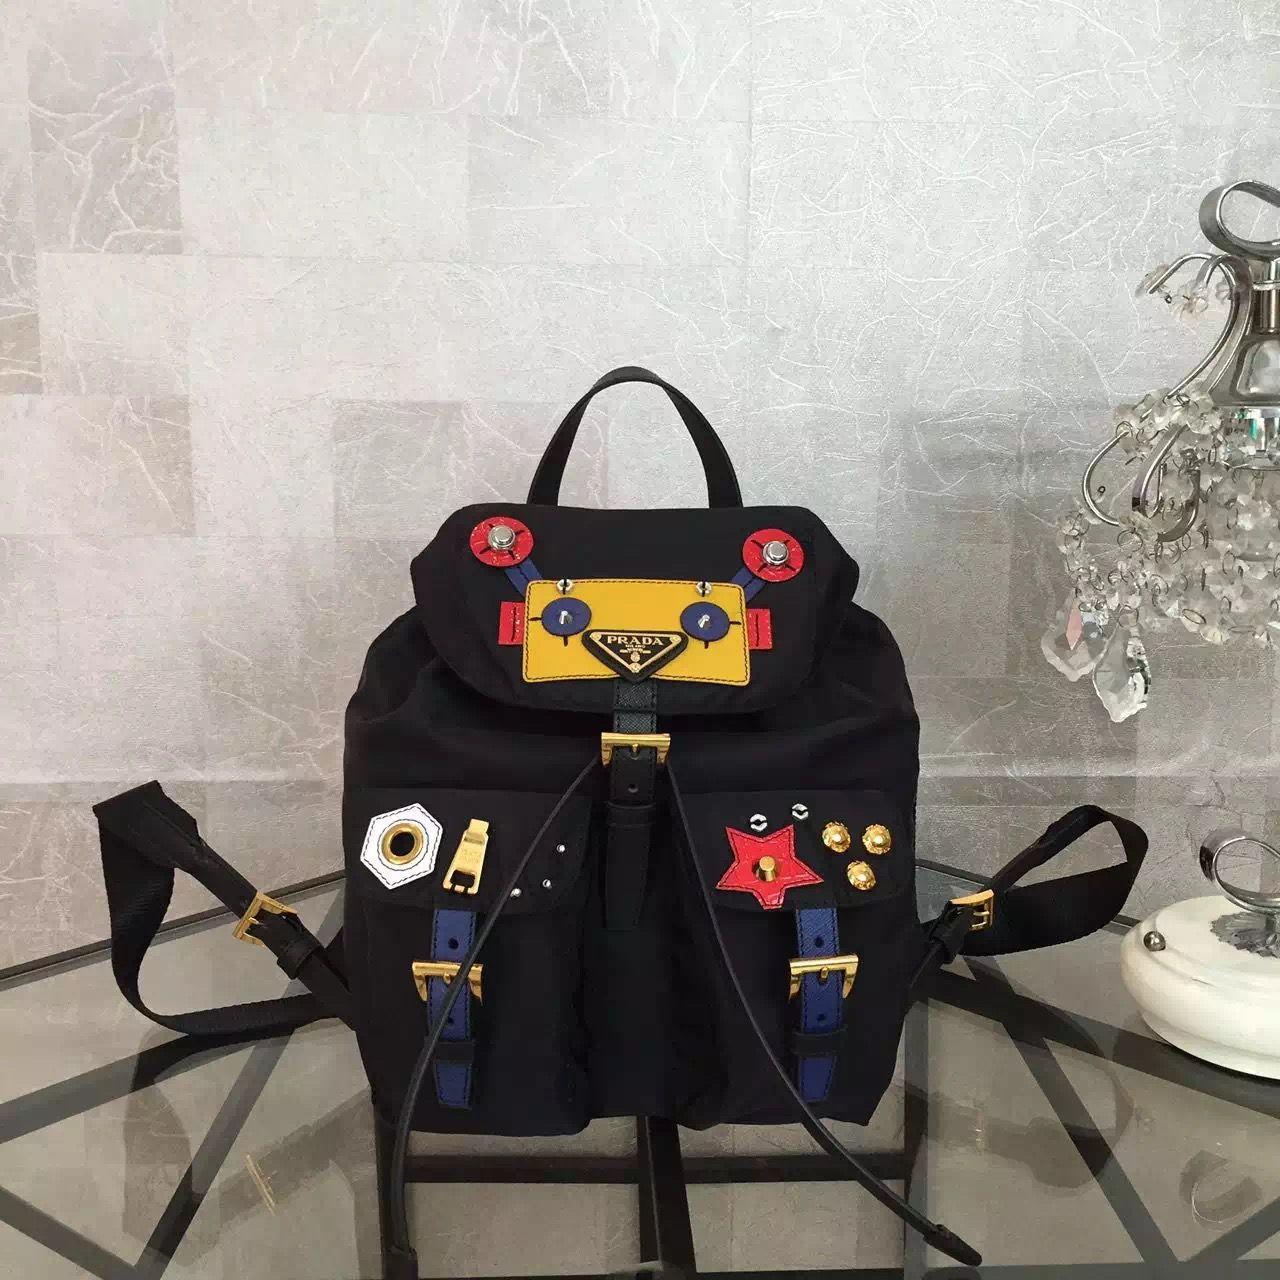 52cc1a8ab004 Prada Fabric Robot Backpack 1BZ677 Black | Prada Backpacks on Sale ...